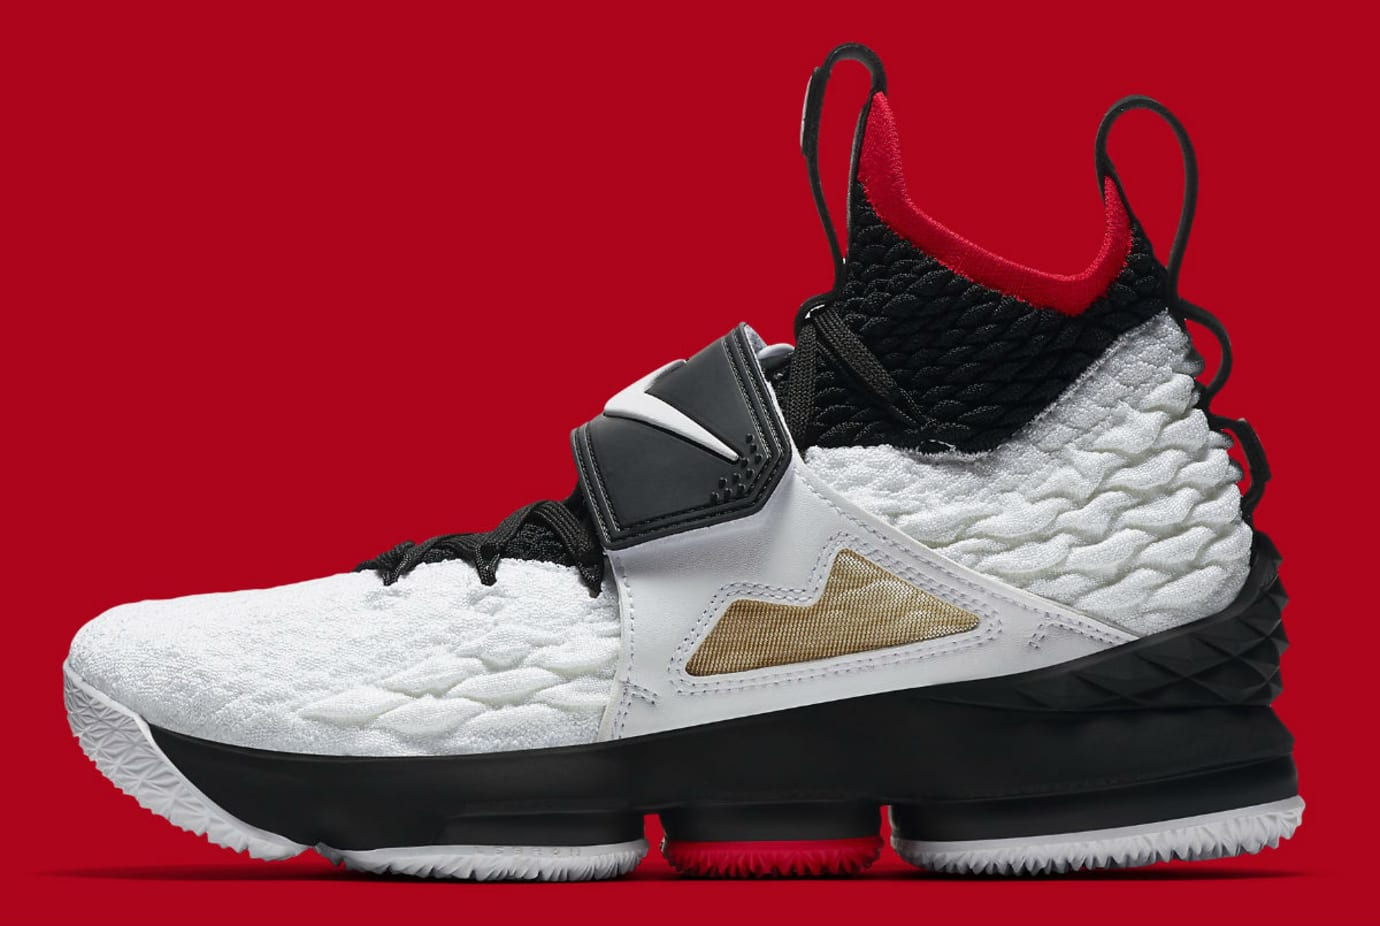 quality design 16d75 2f316 Nike LeBron 15 Diamond Turf Deion Sanders Release Date ...